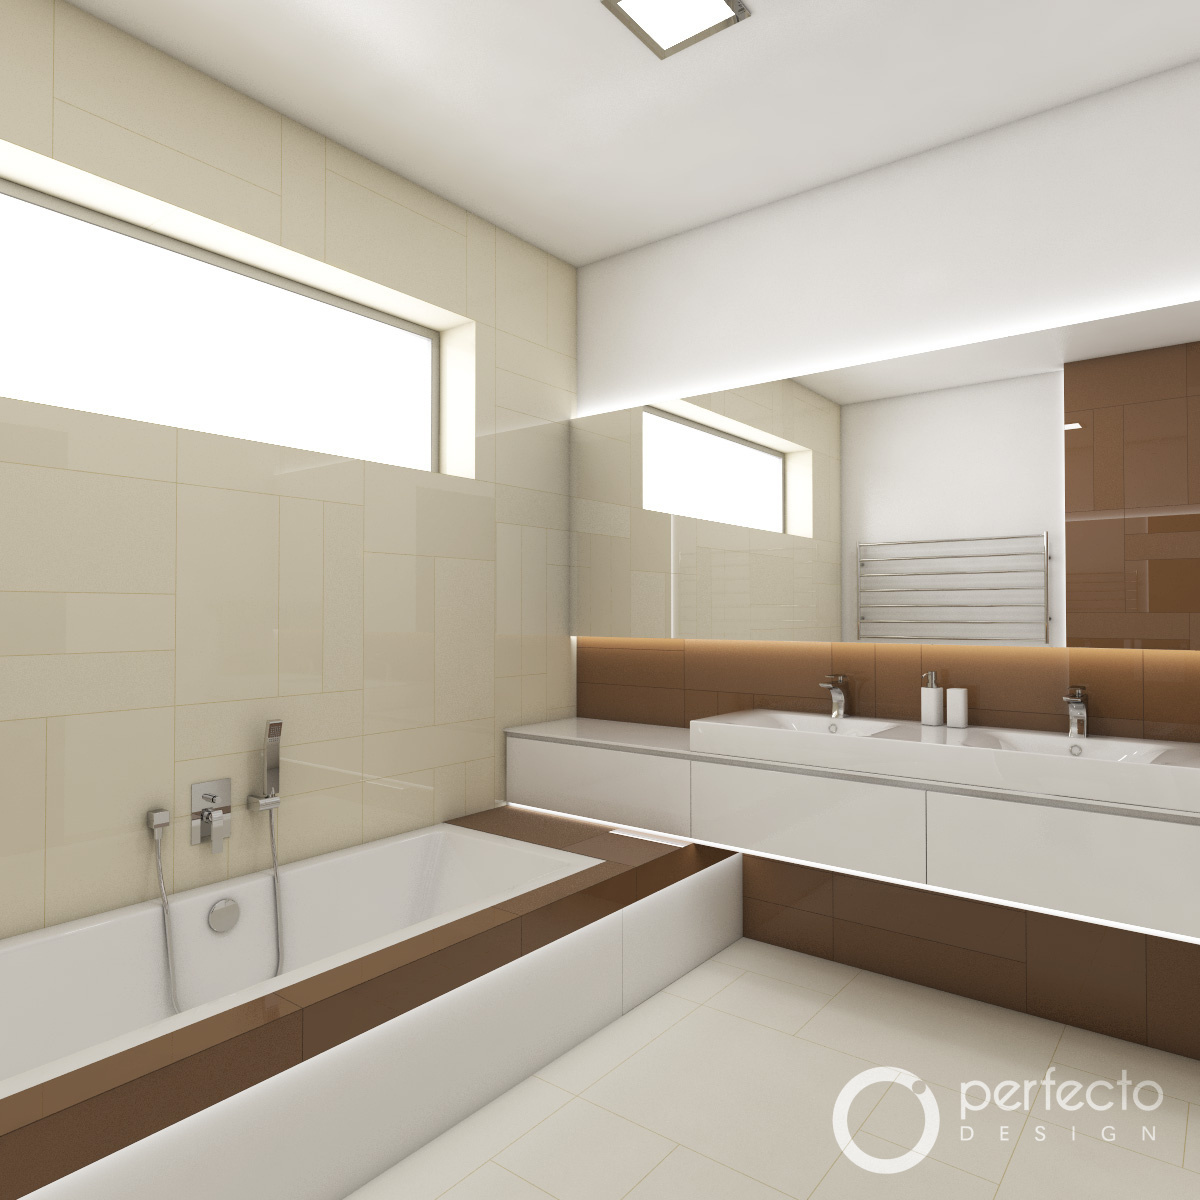 modernes badezimmer latte | perfecto design, Badezimmer ideen